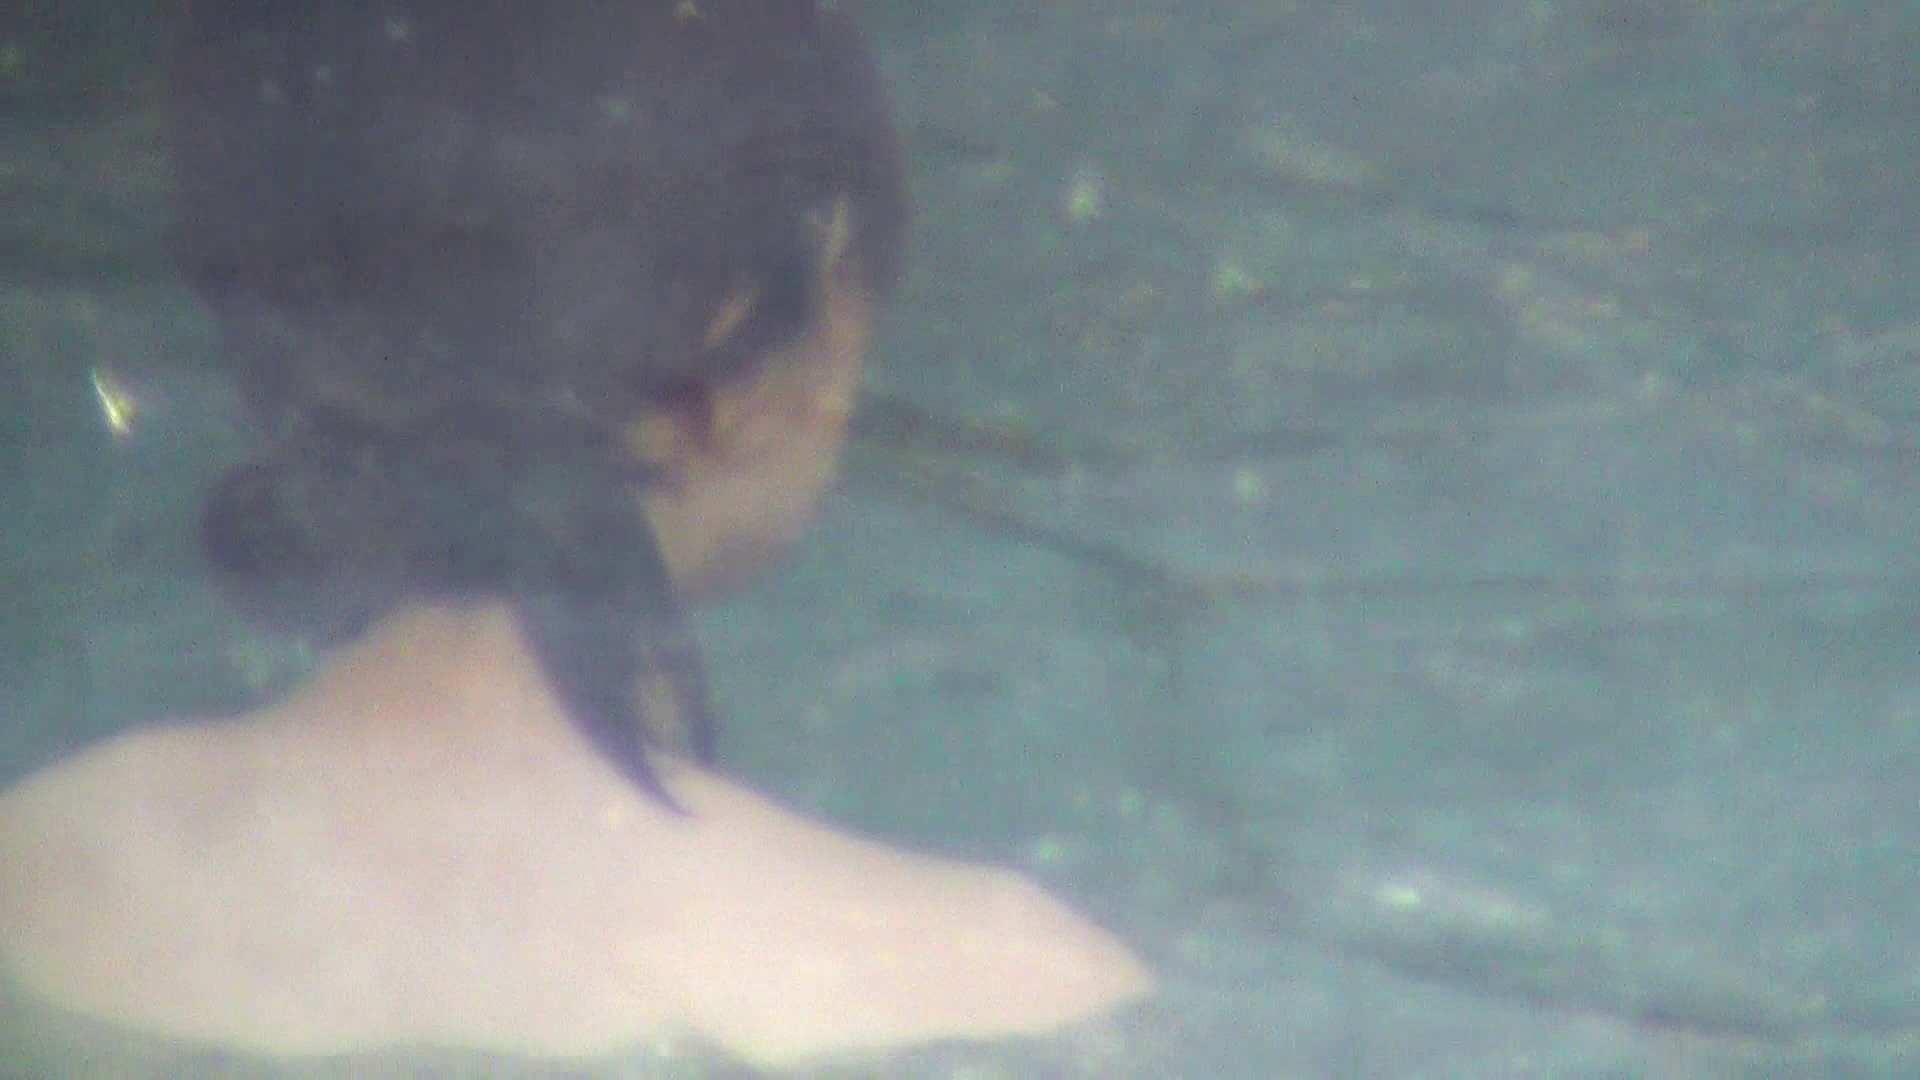 Aquaな露天風呂Vol.271 露天風呂編 | 盗撮シリーズ  95PIX 11